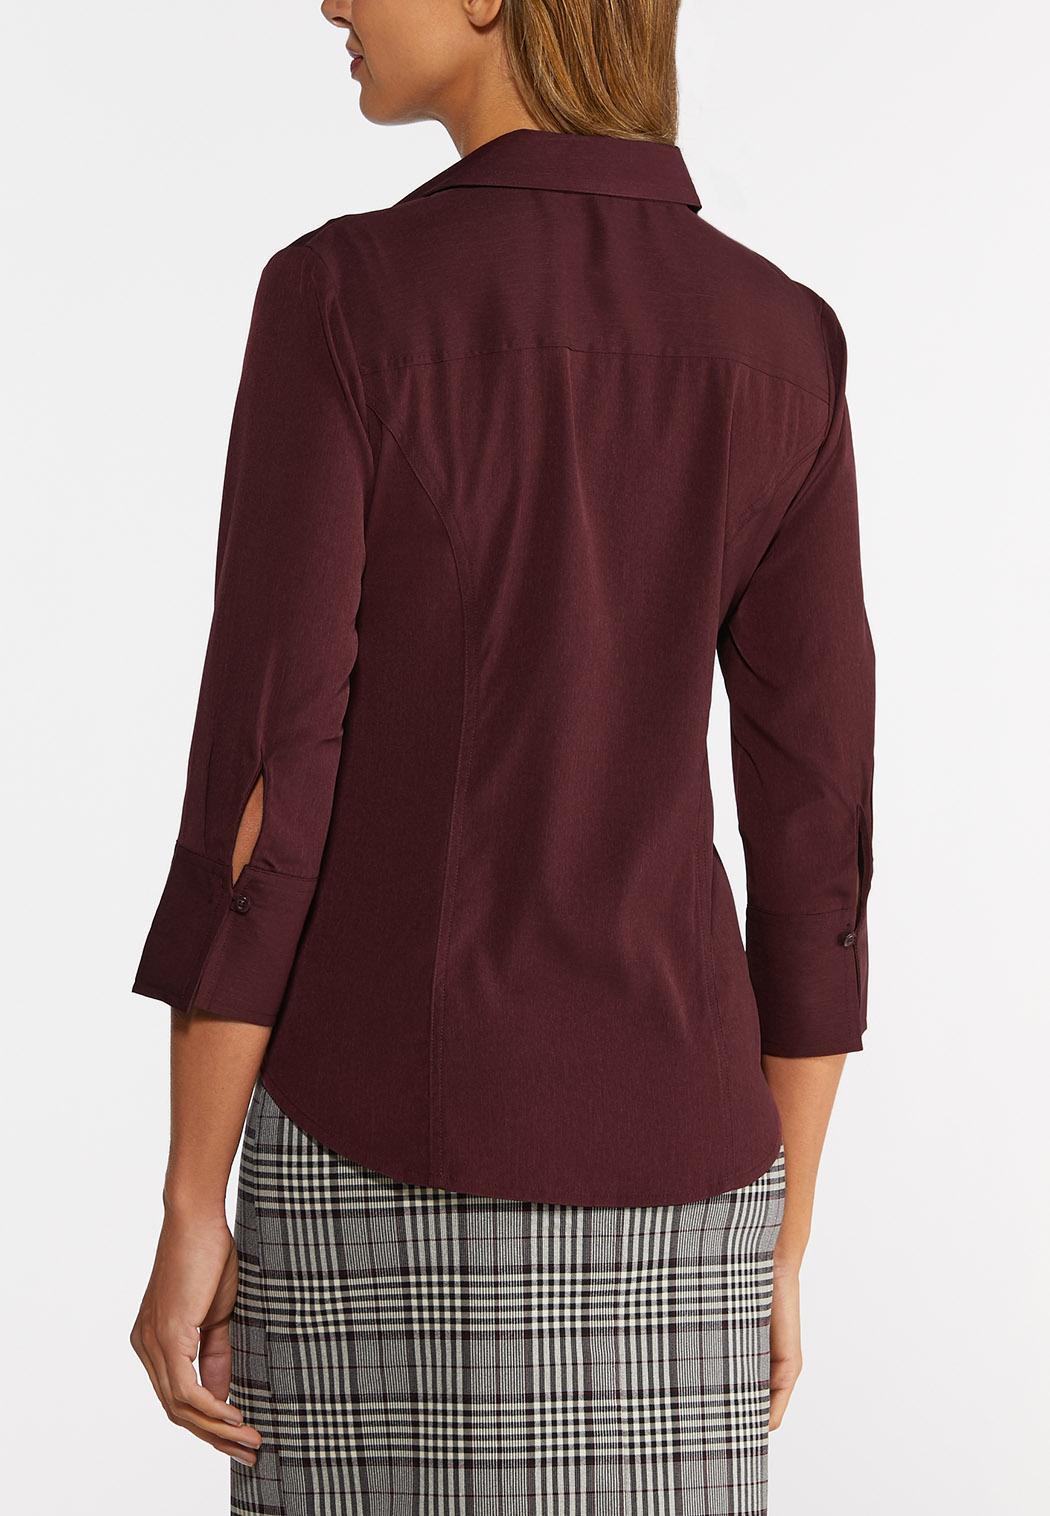 Plus Size Stretch Button Down Shirt (Item #44366788)